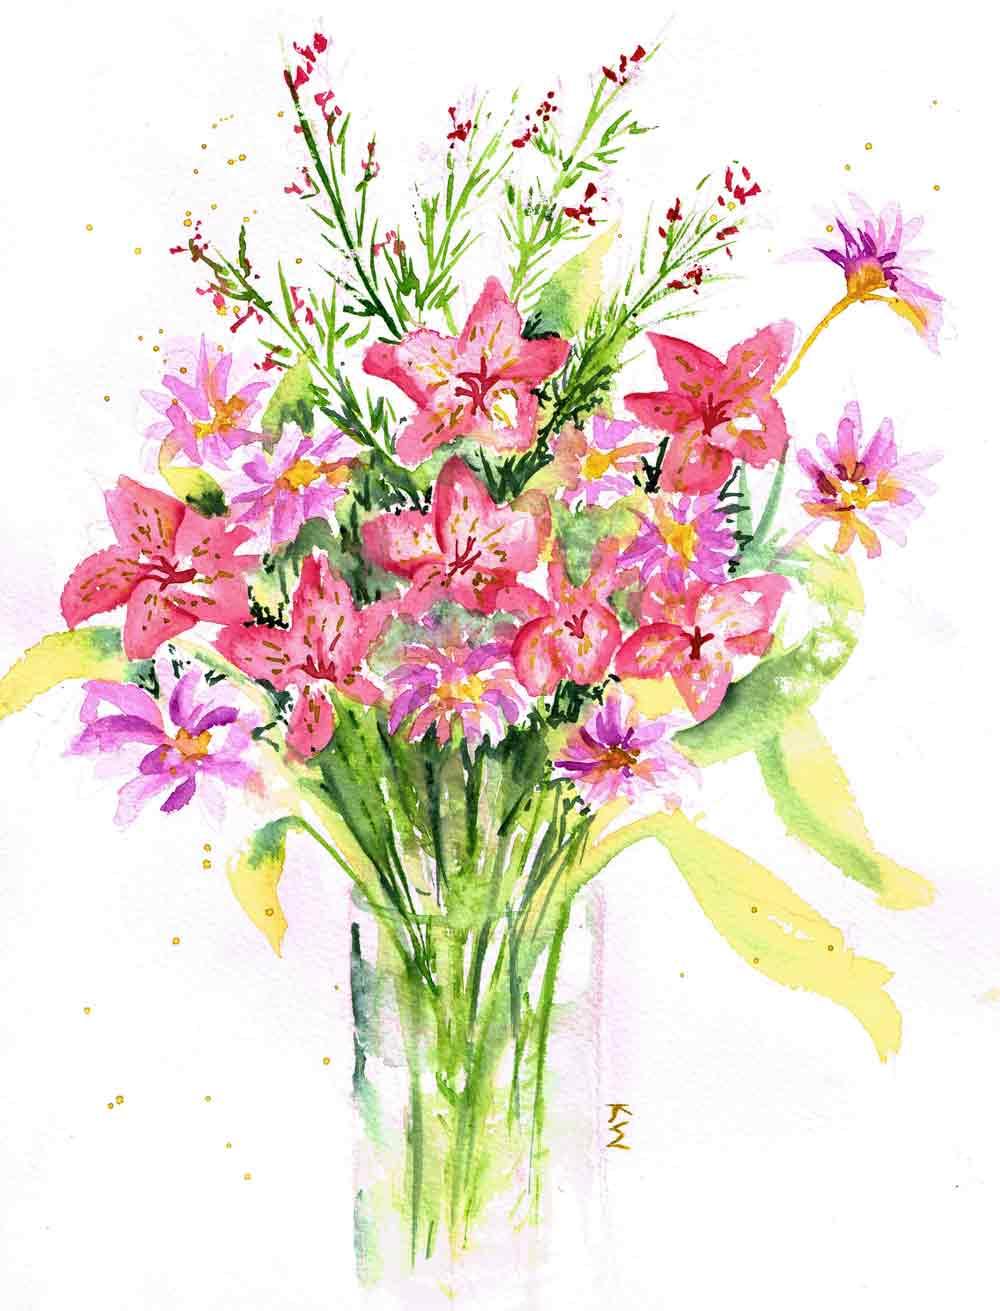 Fresh-flowers-scan-no-7-kw.jpg